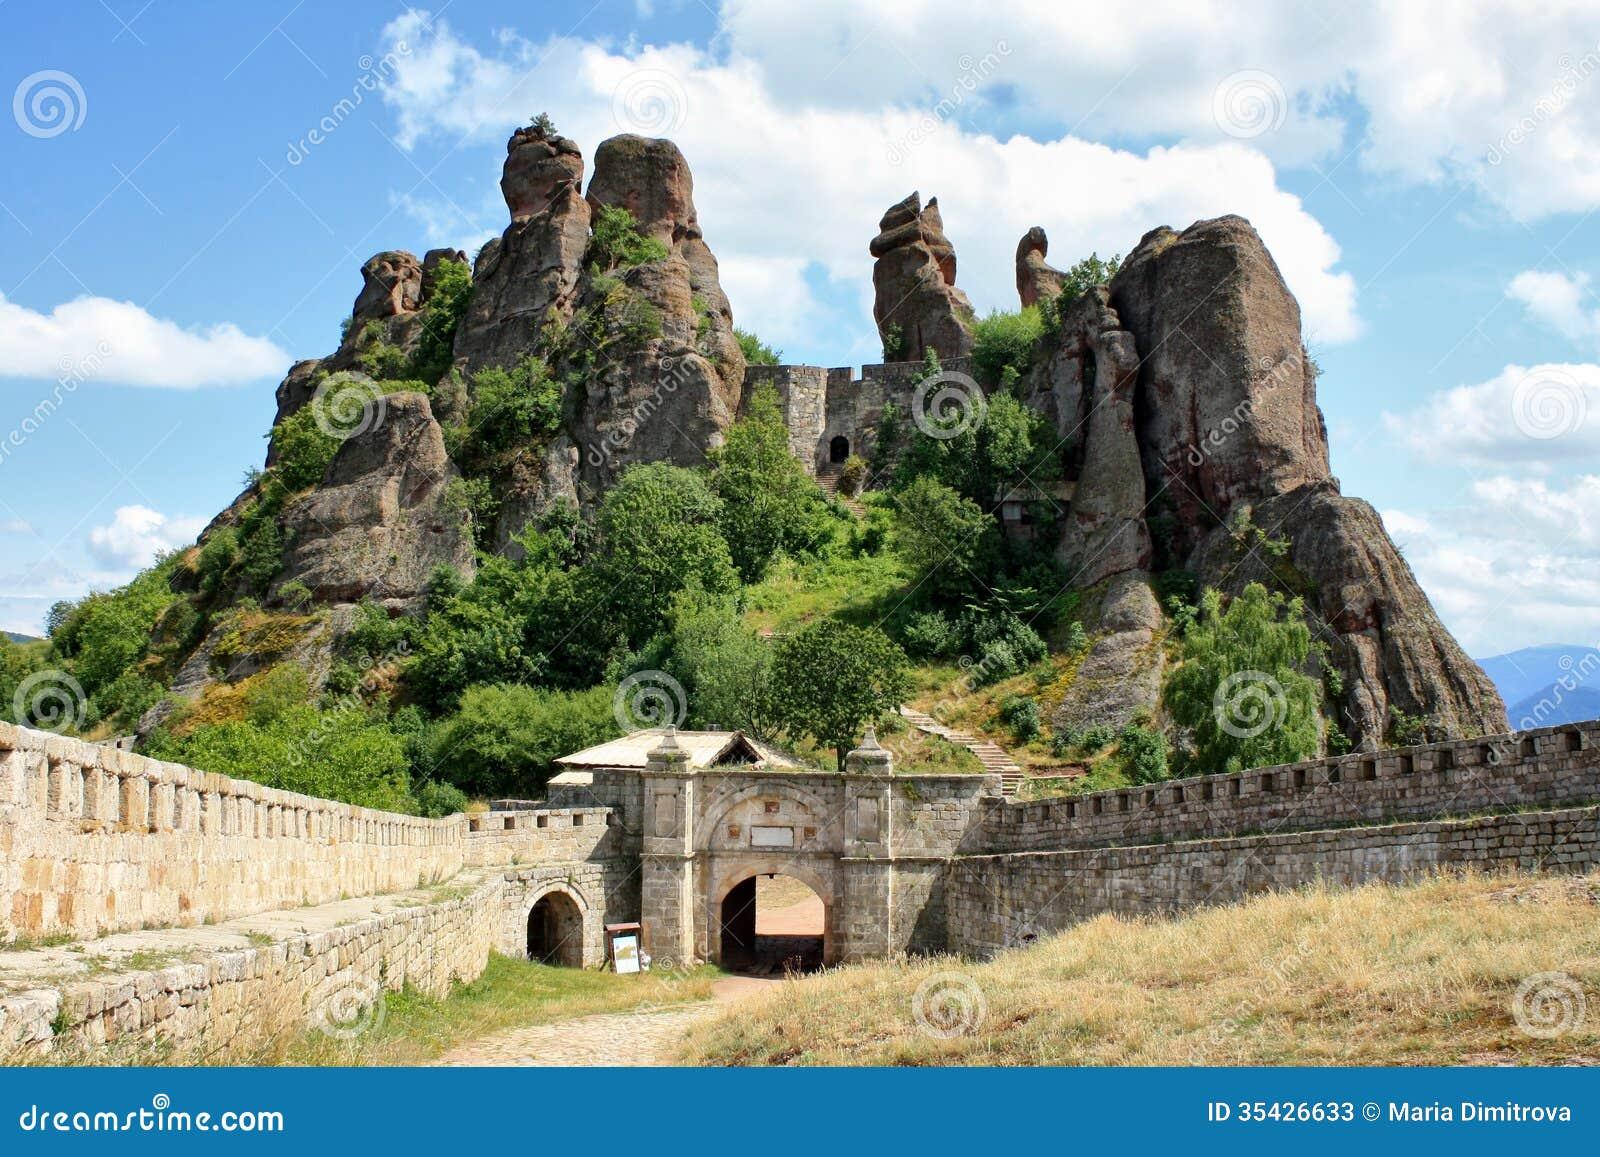 The Belogradchik Rocks Wonder Stock Photos Image 35426633